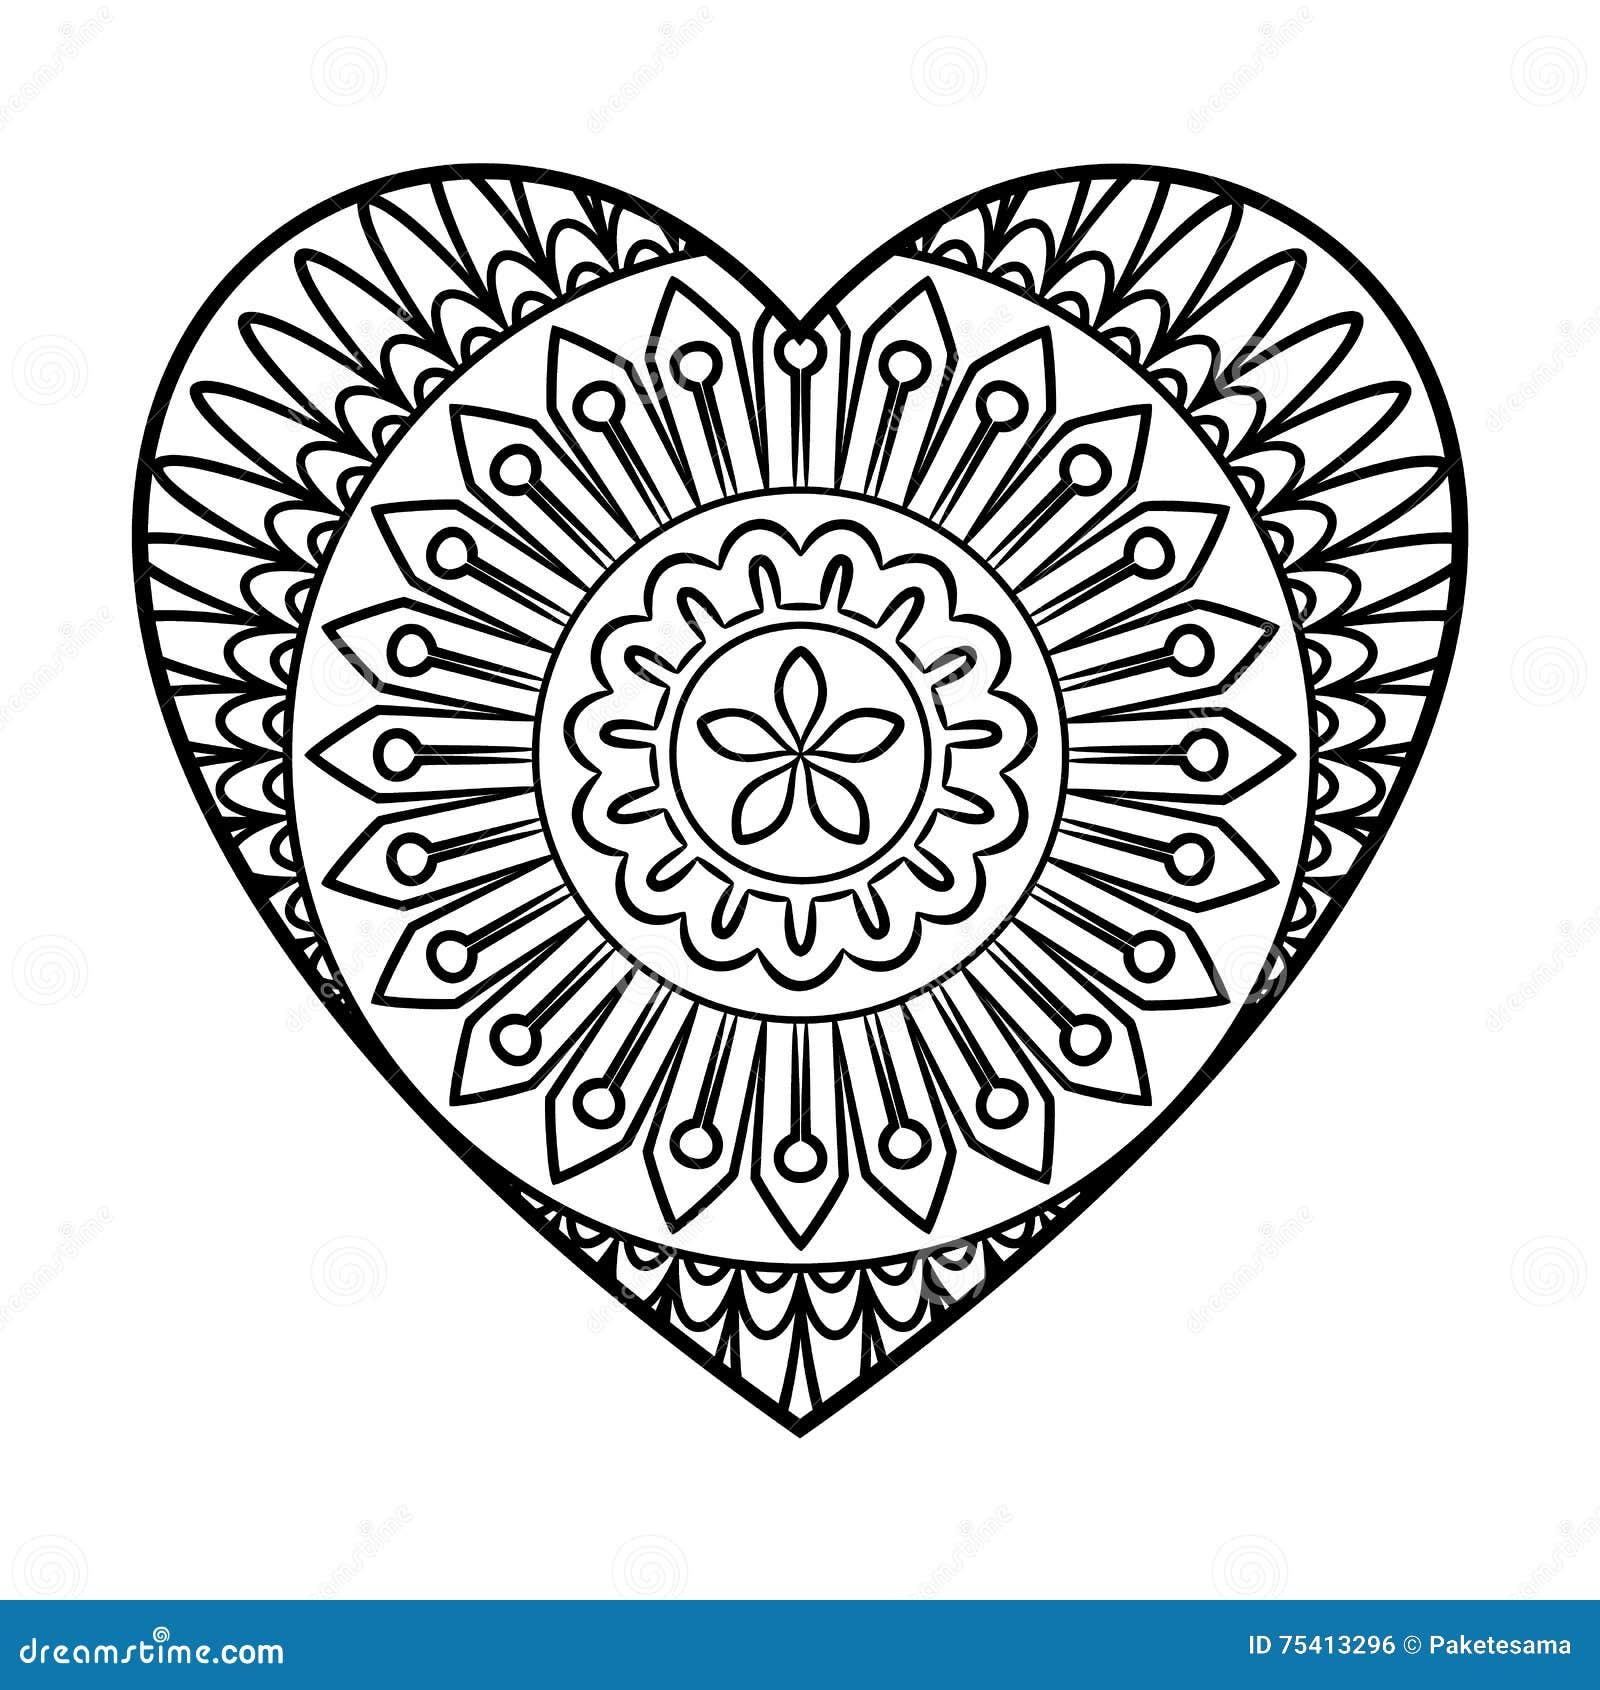 Mandala de coeur stock illustrations vecteurs clipart 2 884 stock illustrations - Mandala de coeur ...